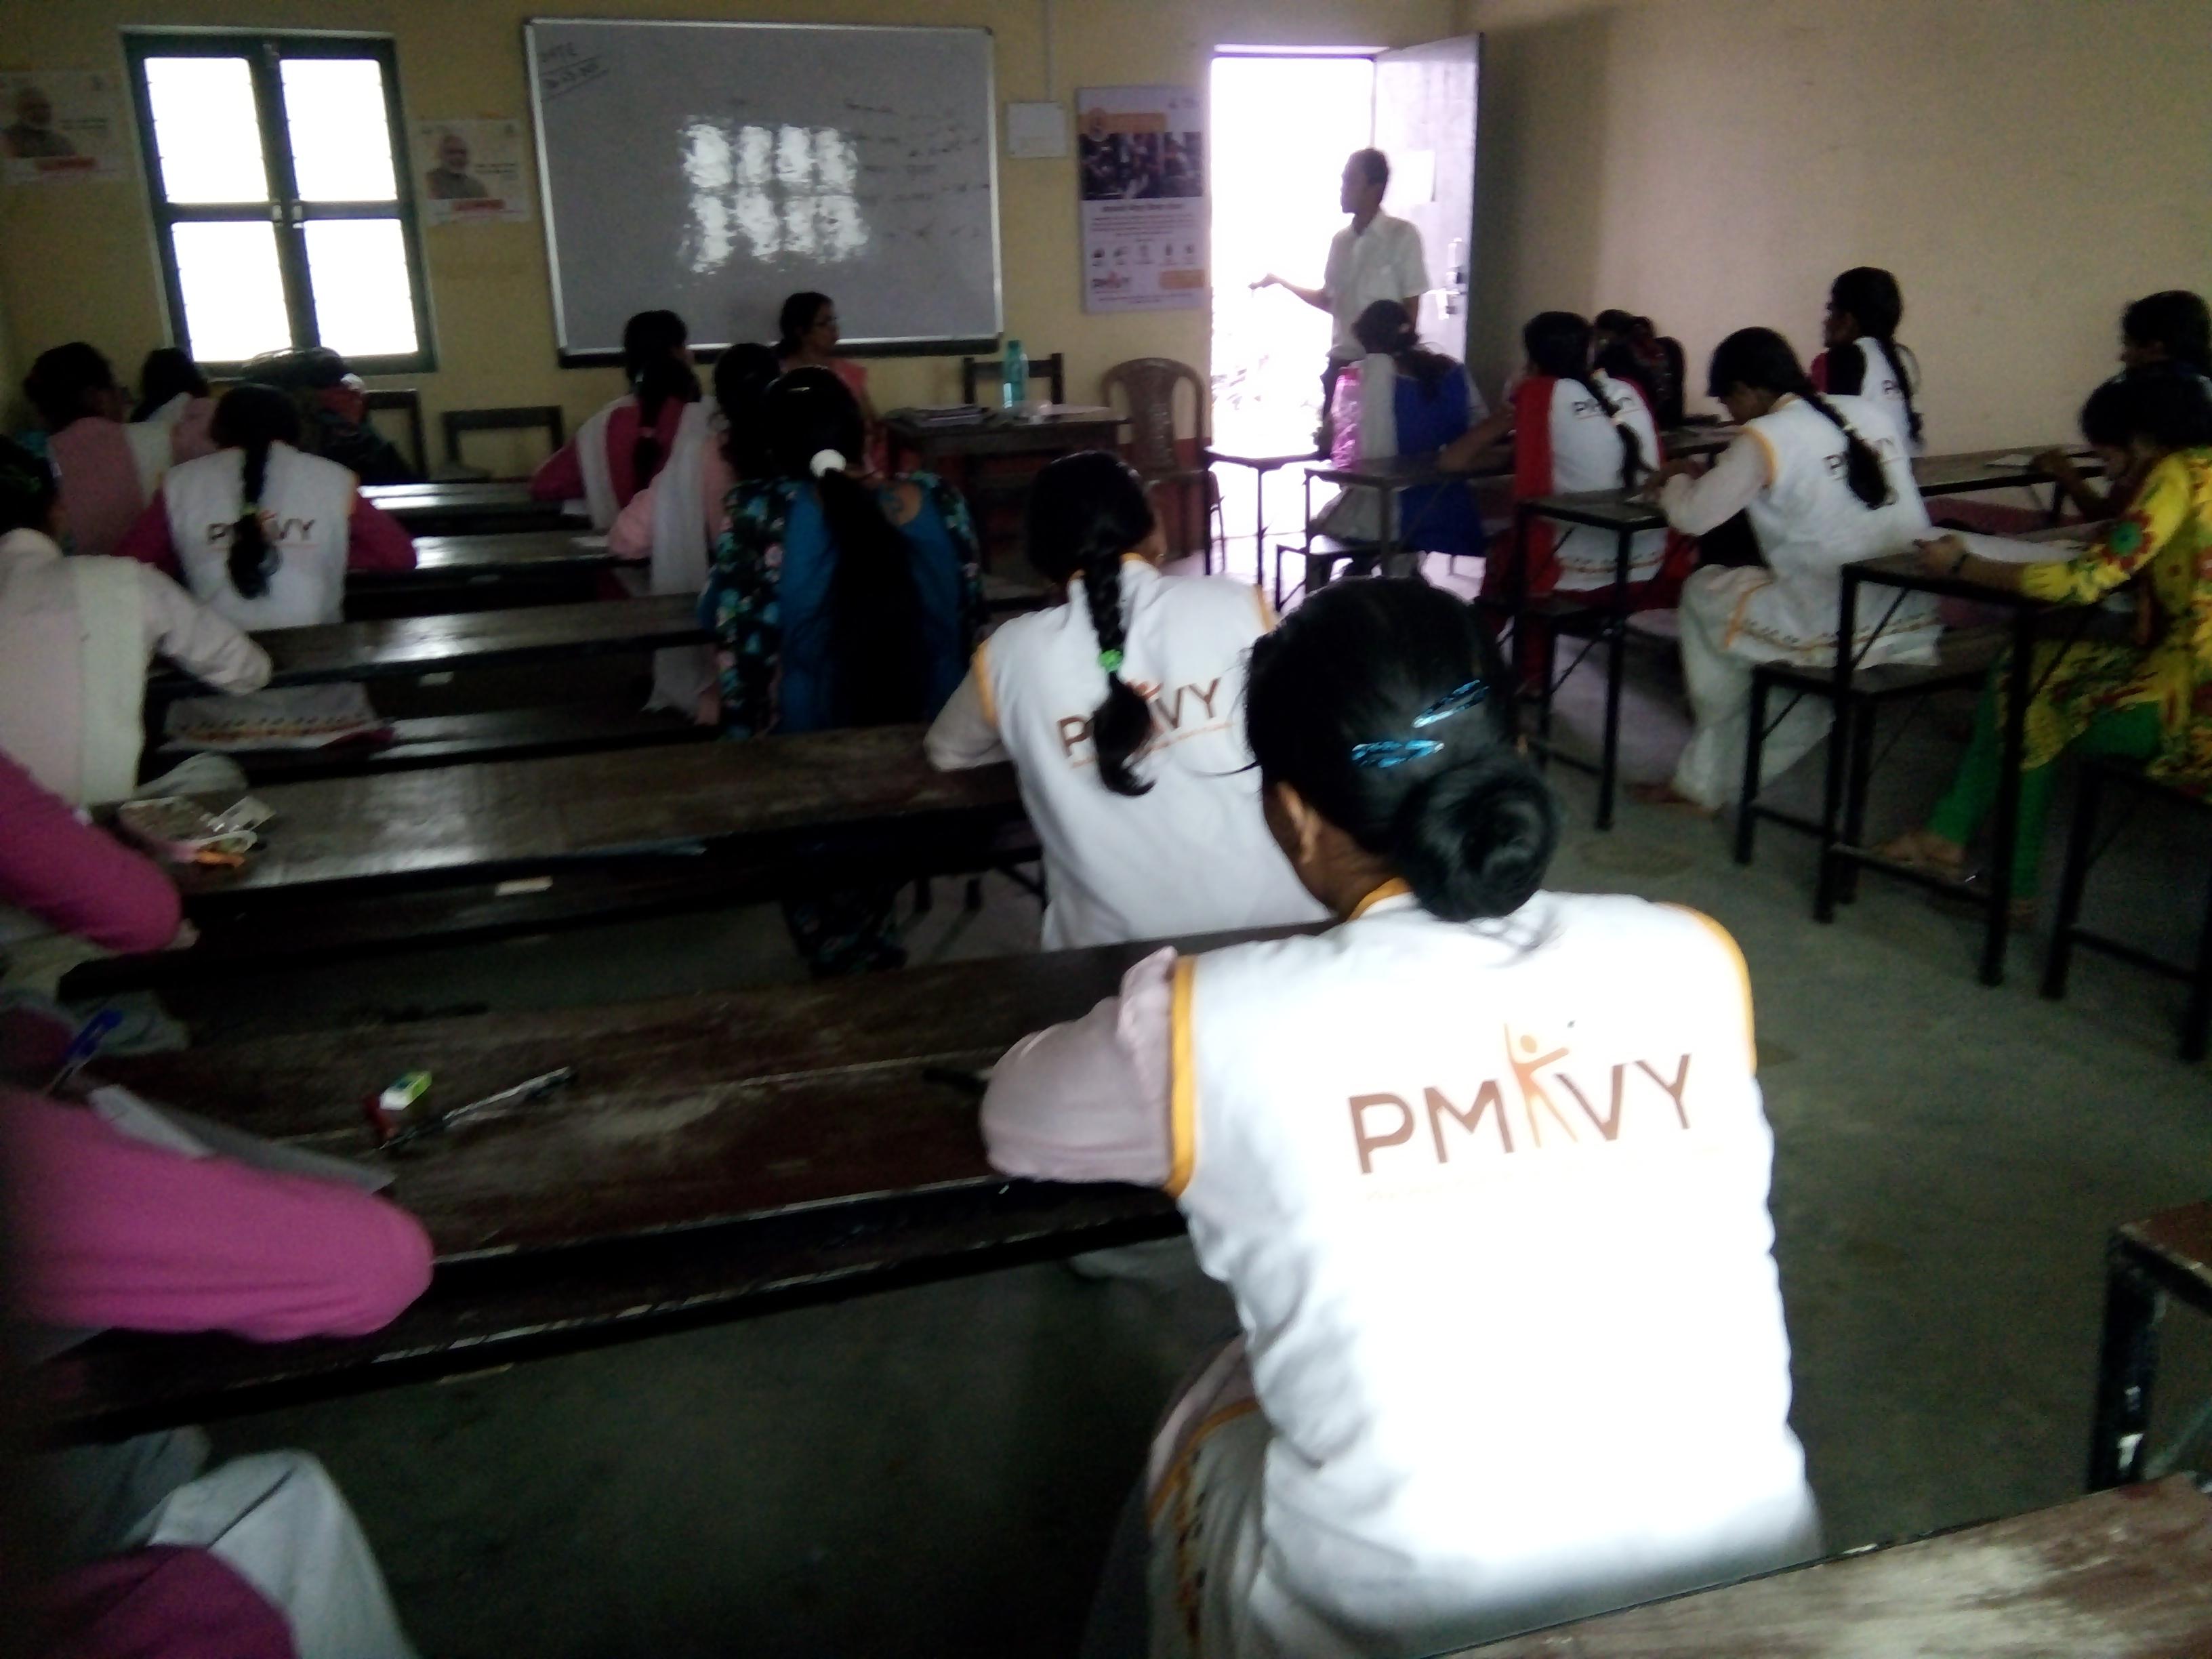 PMKVY Training at Sunaina Samriddhi Foundation Centre at Maharajganj, Uttar Pradesh